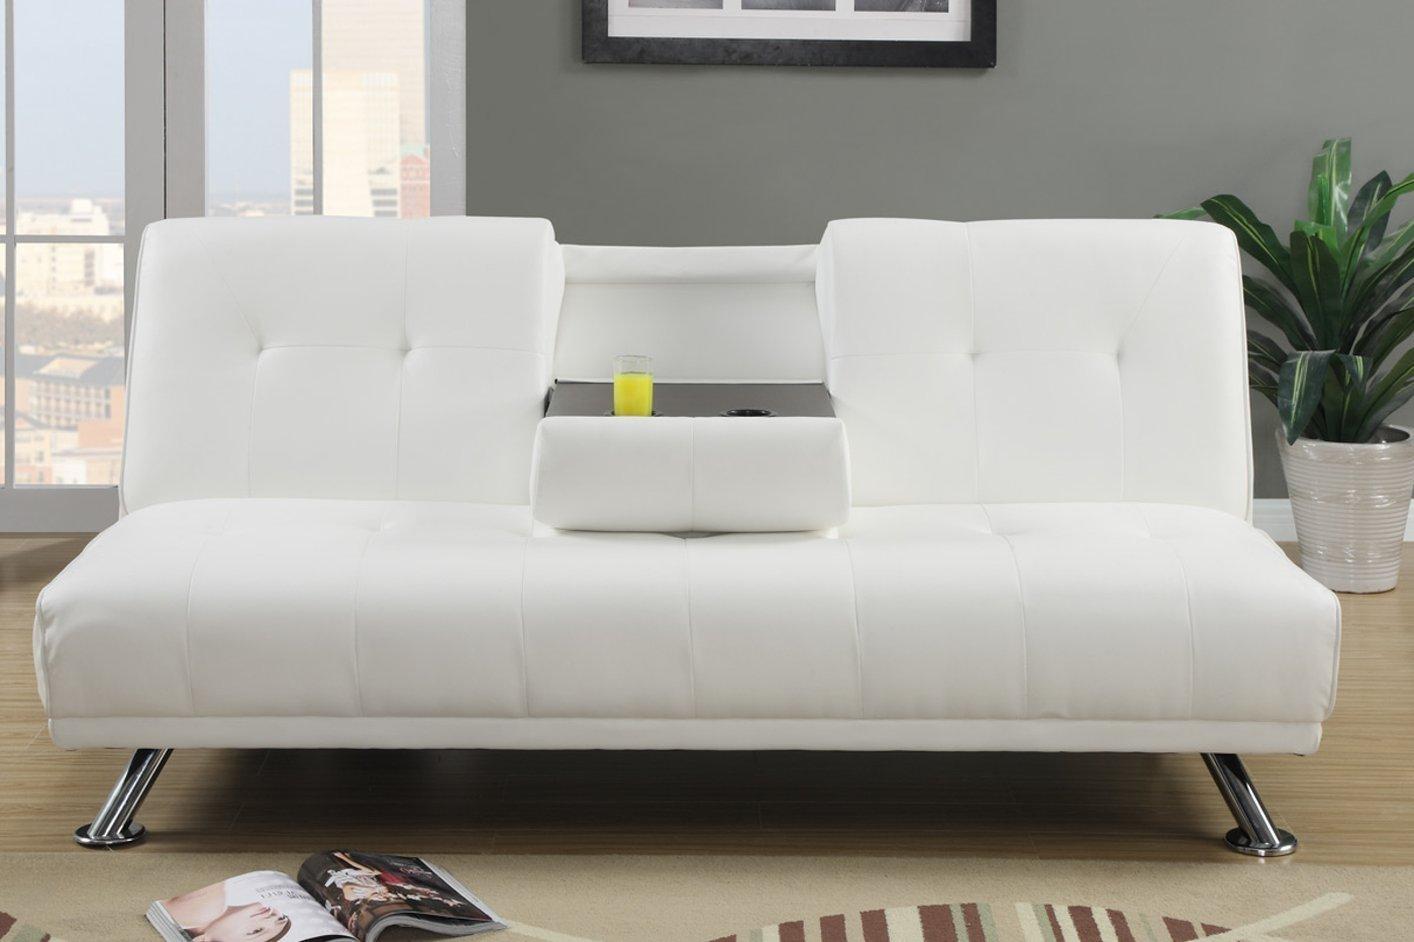 White Leather Futon Sofa Bed   Roselawnlutheran For Faux Leather Futon Sofas (View 16 of 20)